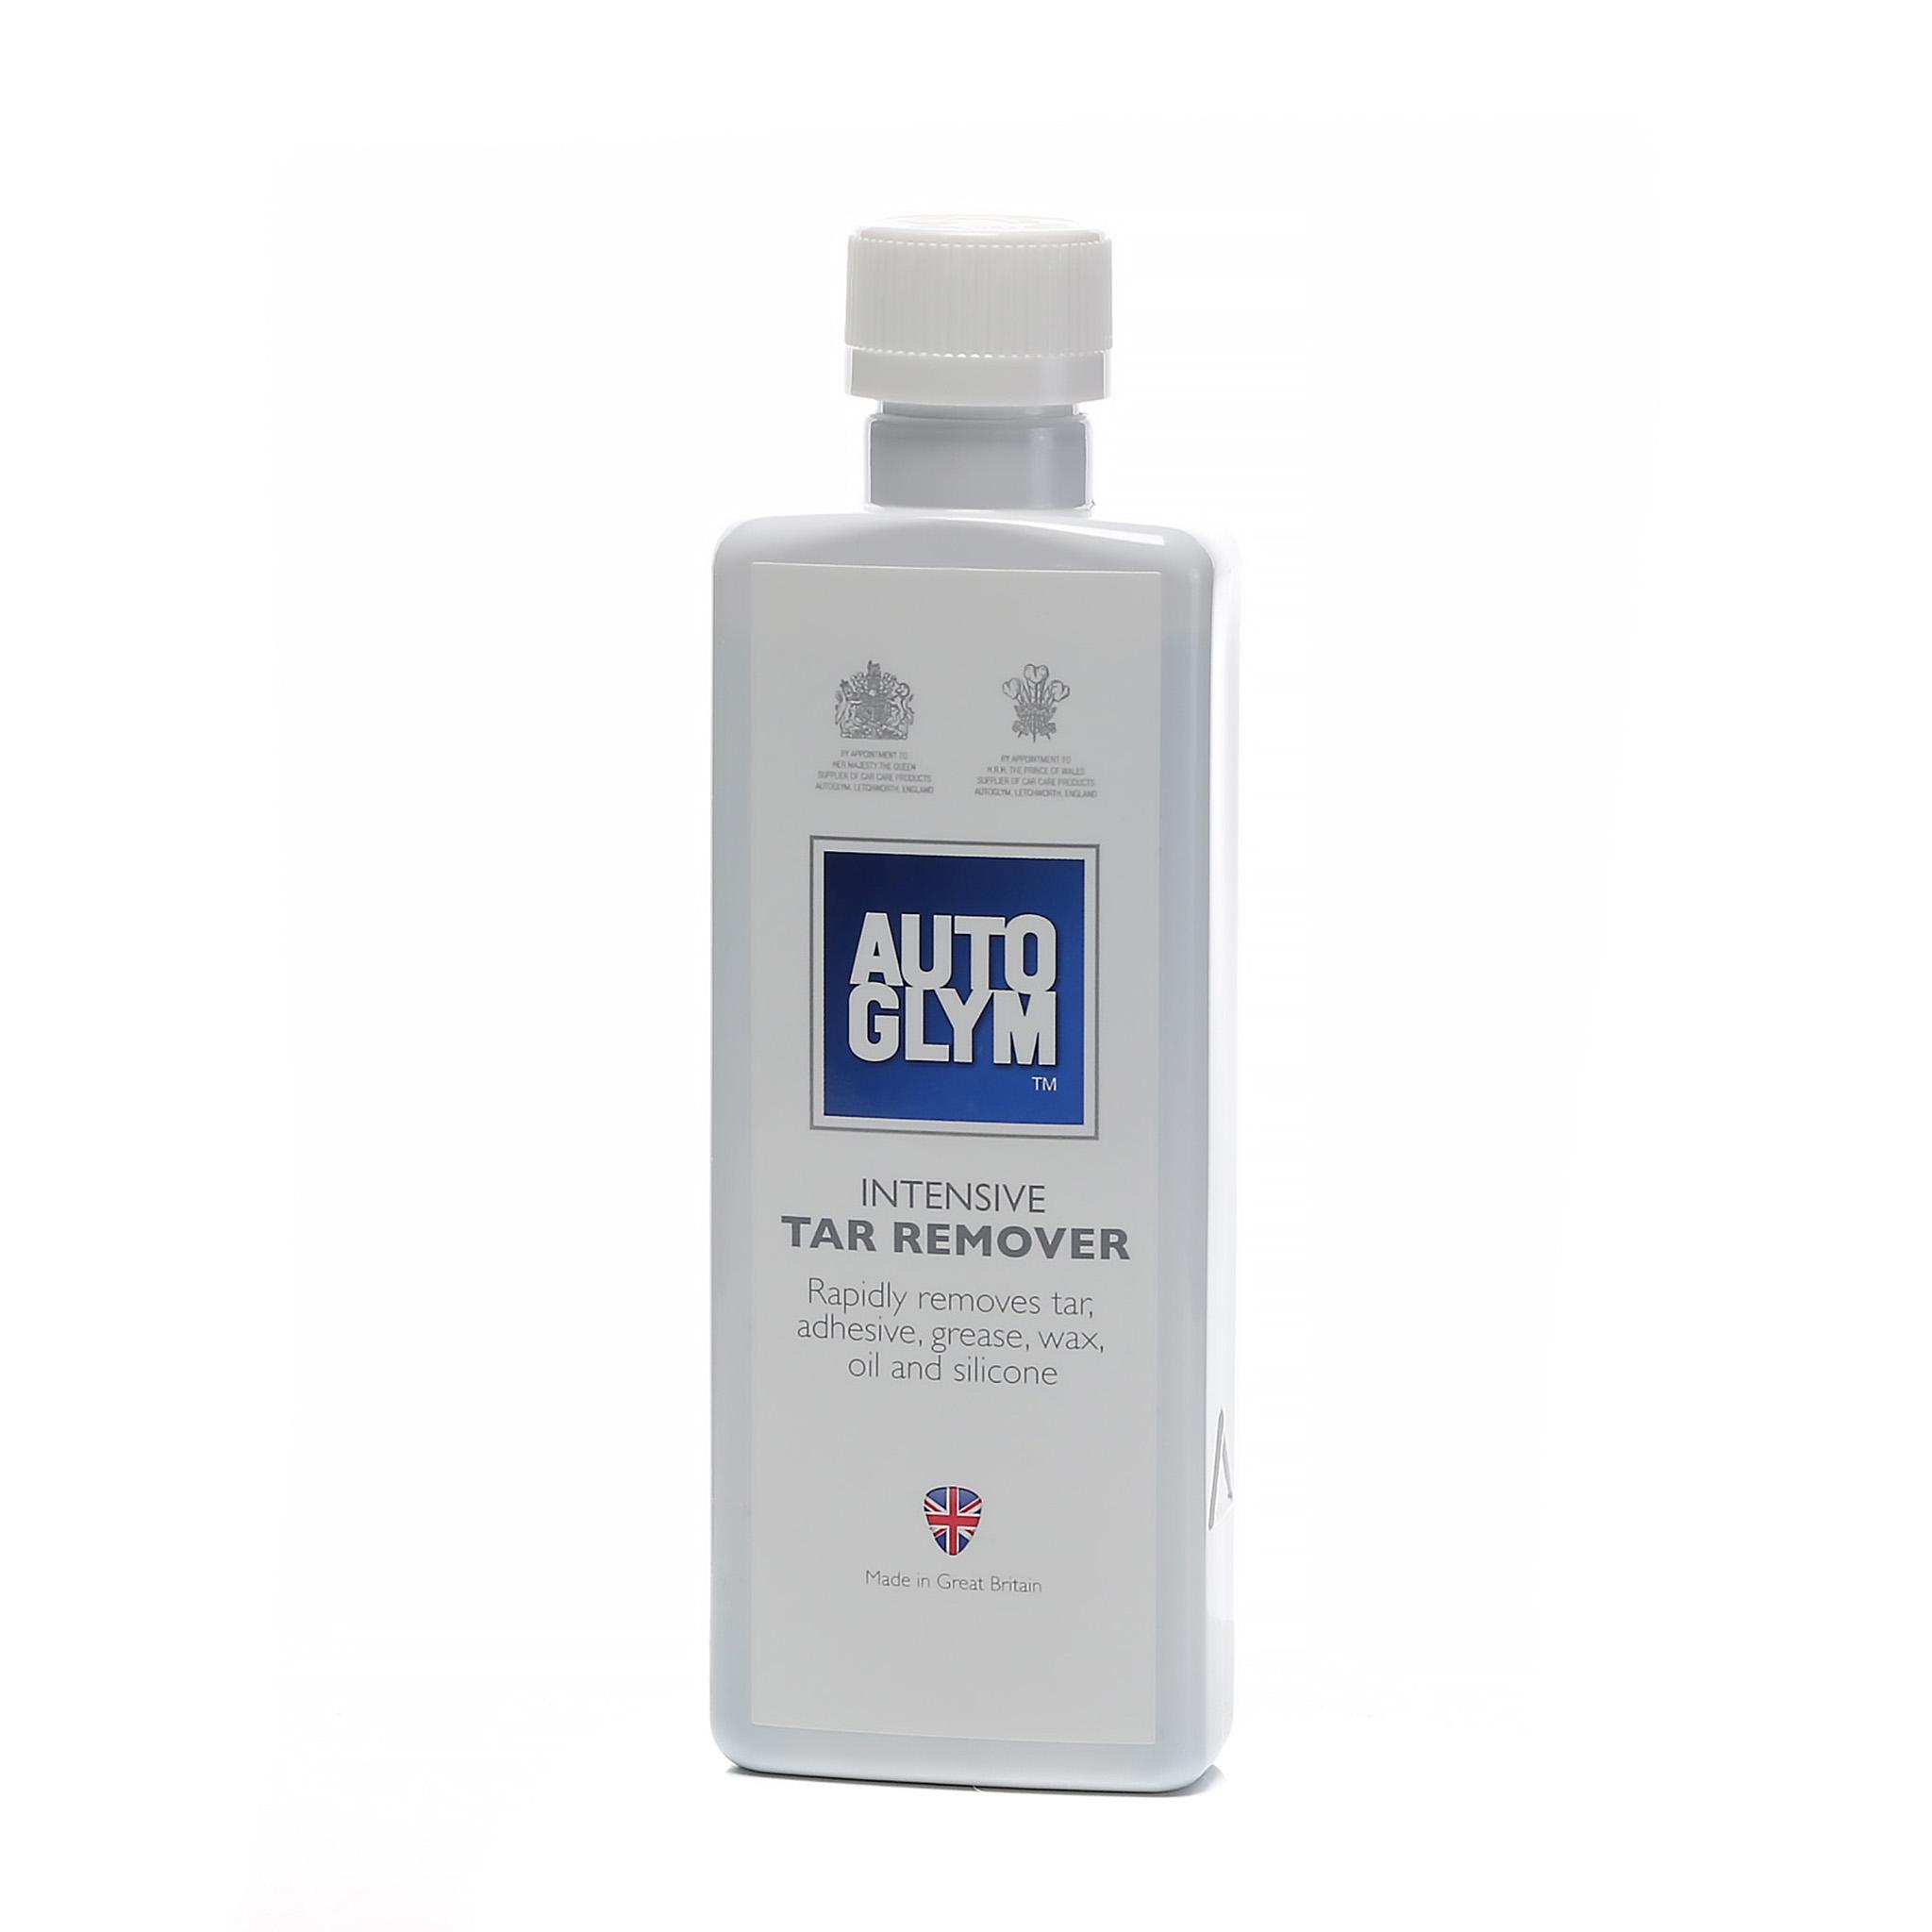 Tjärlösare Autoglym Intensive Tar Remover, 325 ml